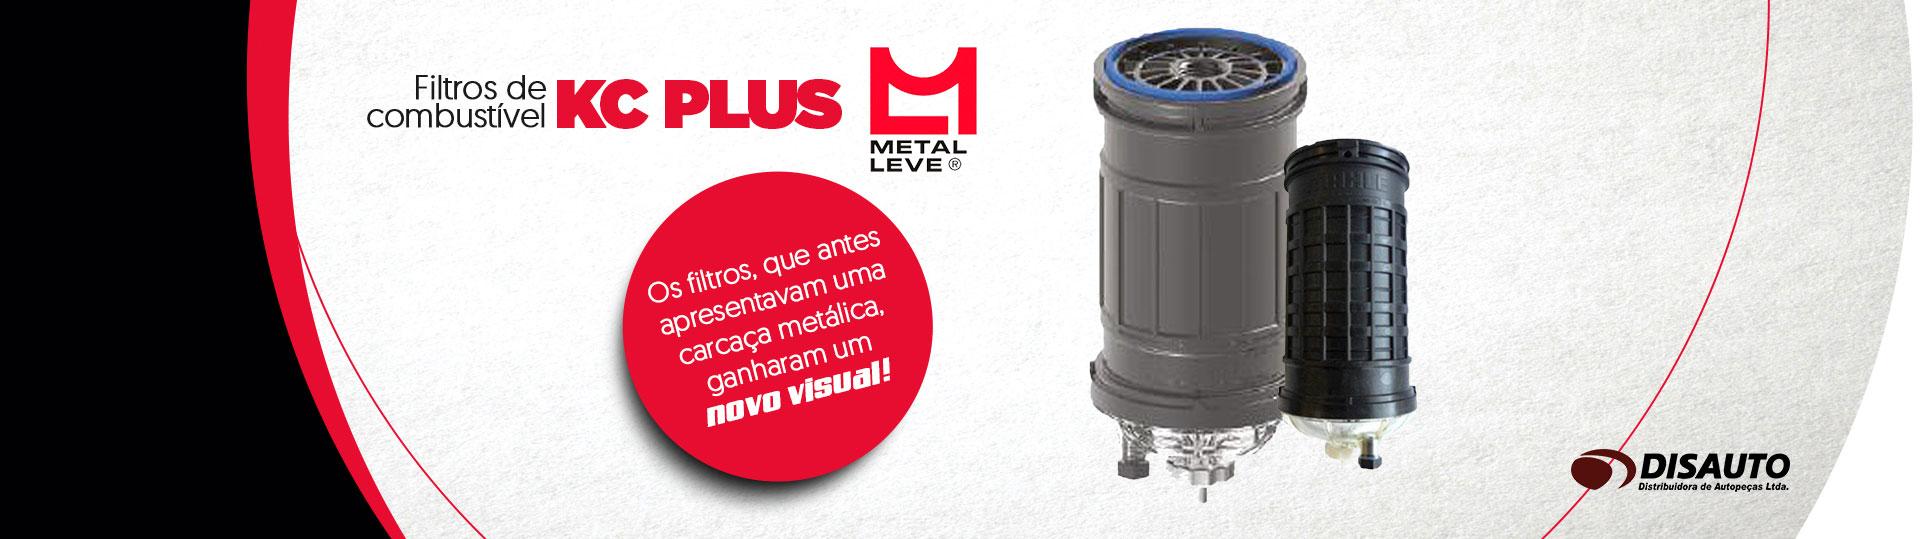 Filtros de Combustível KM Plus Disauto